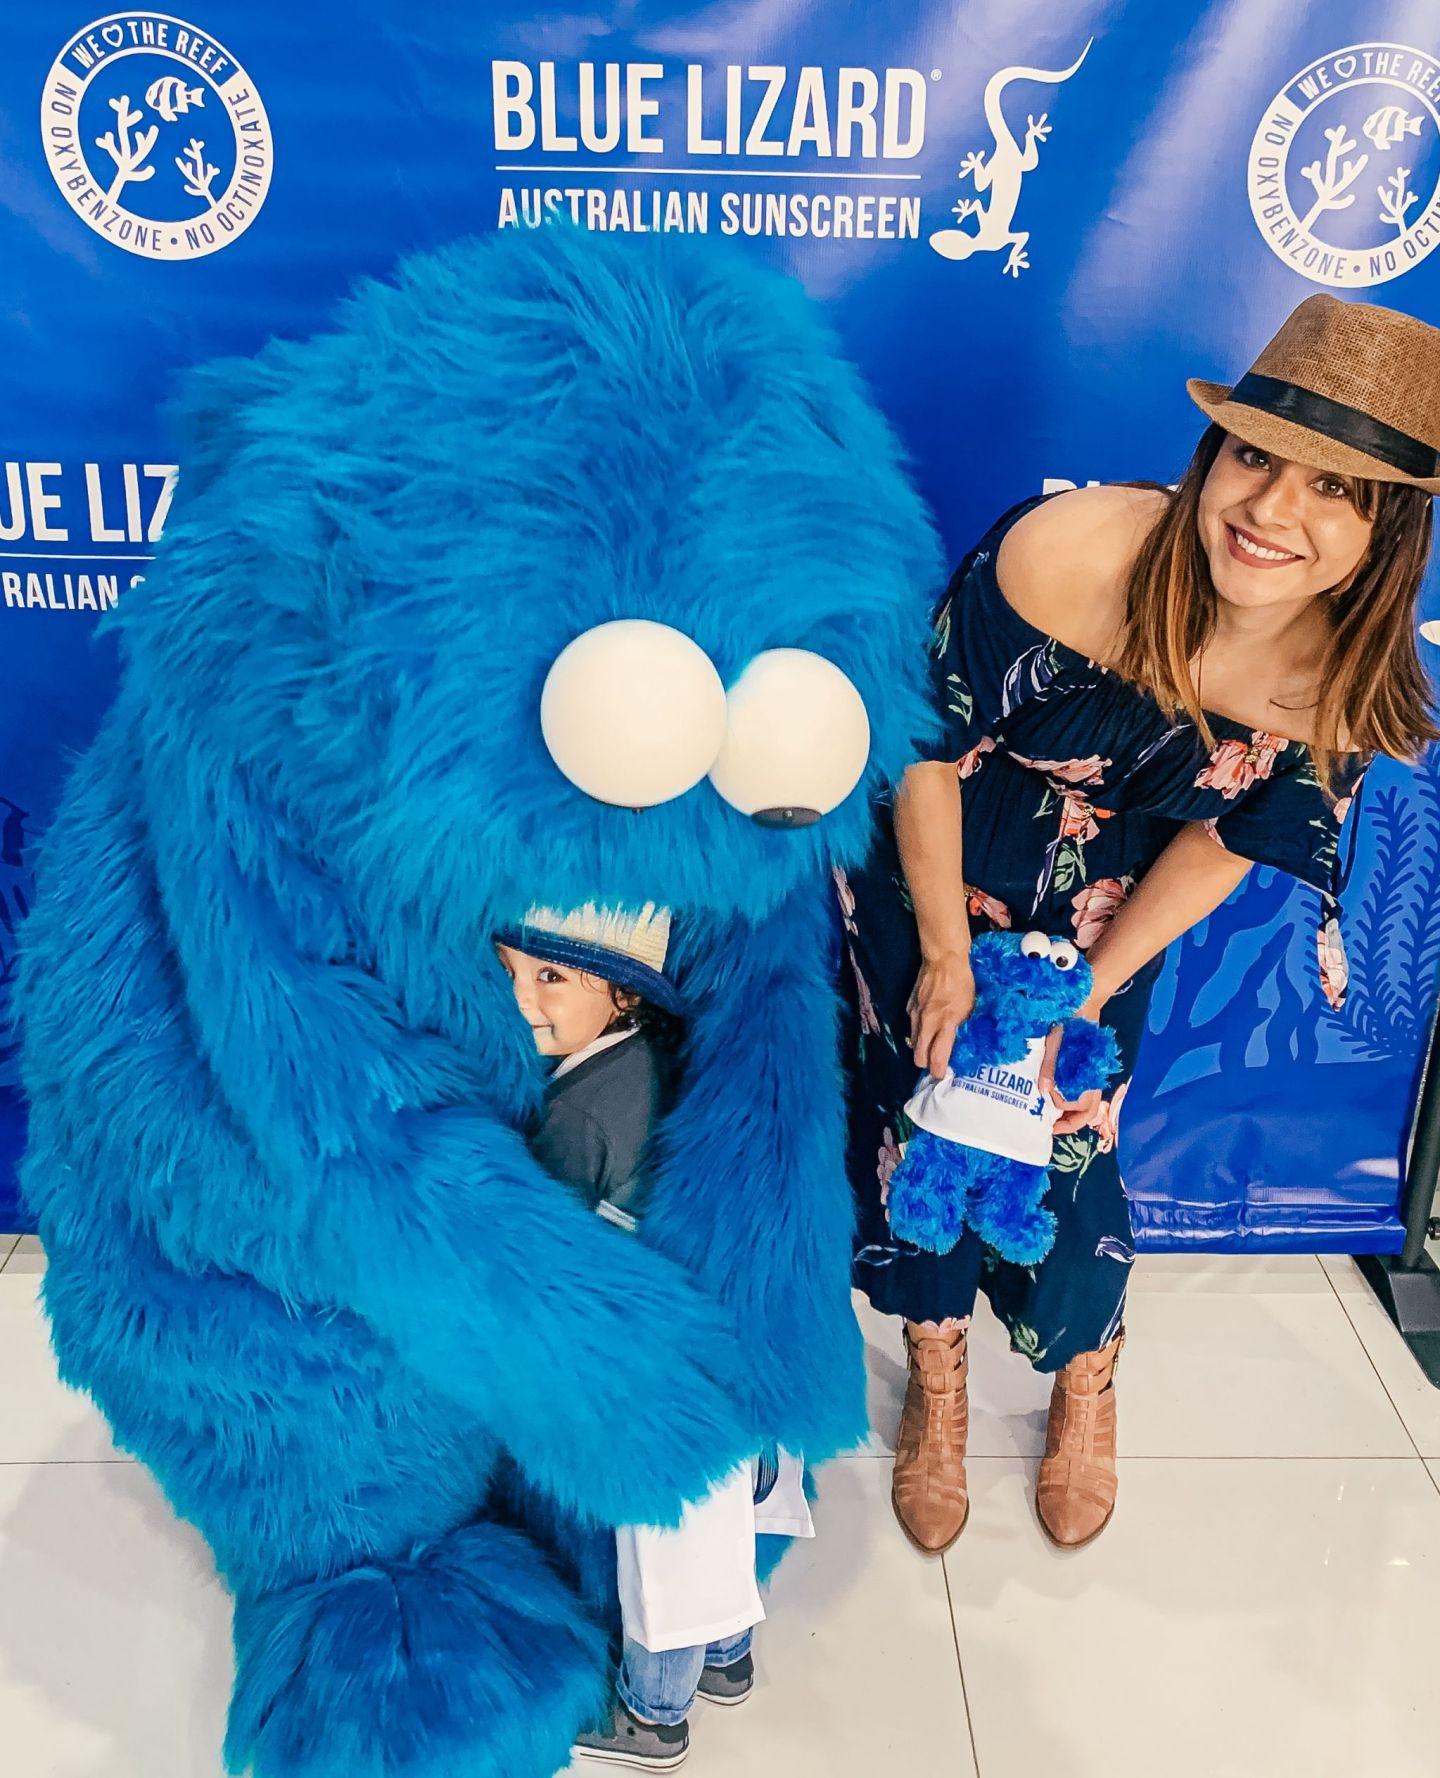 Blue Lizard Mineral Sunscreen Laura Navarrete 5